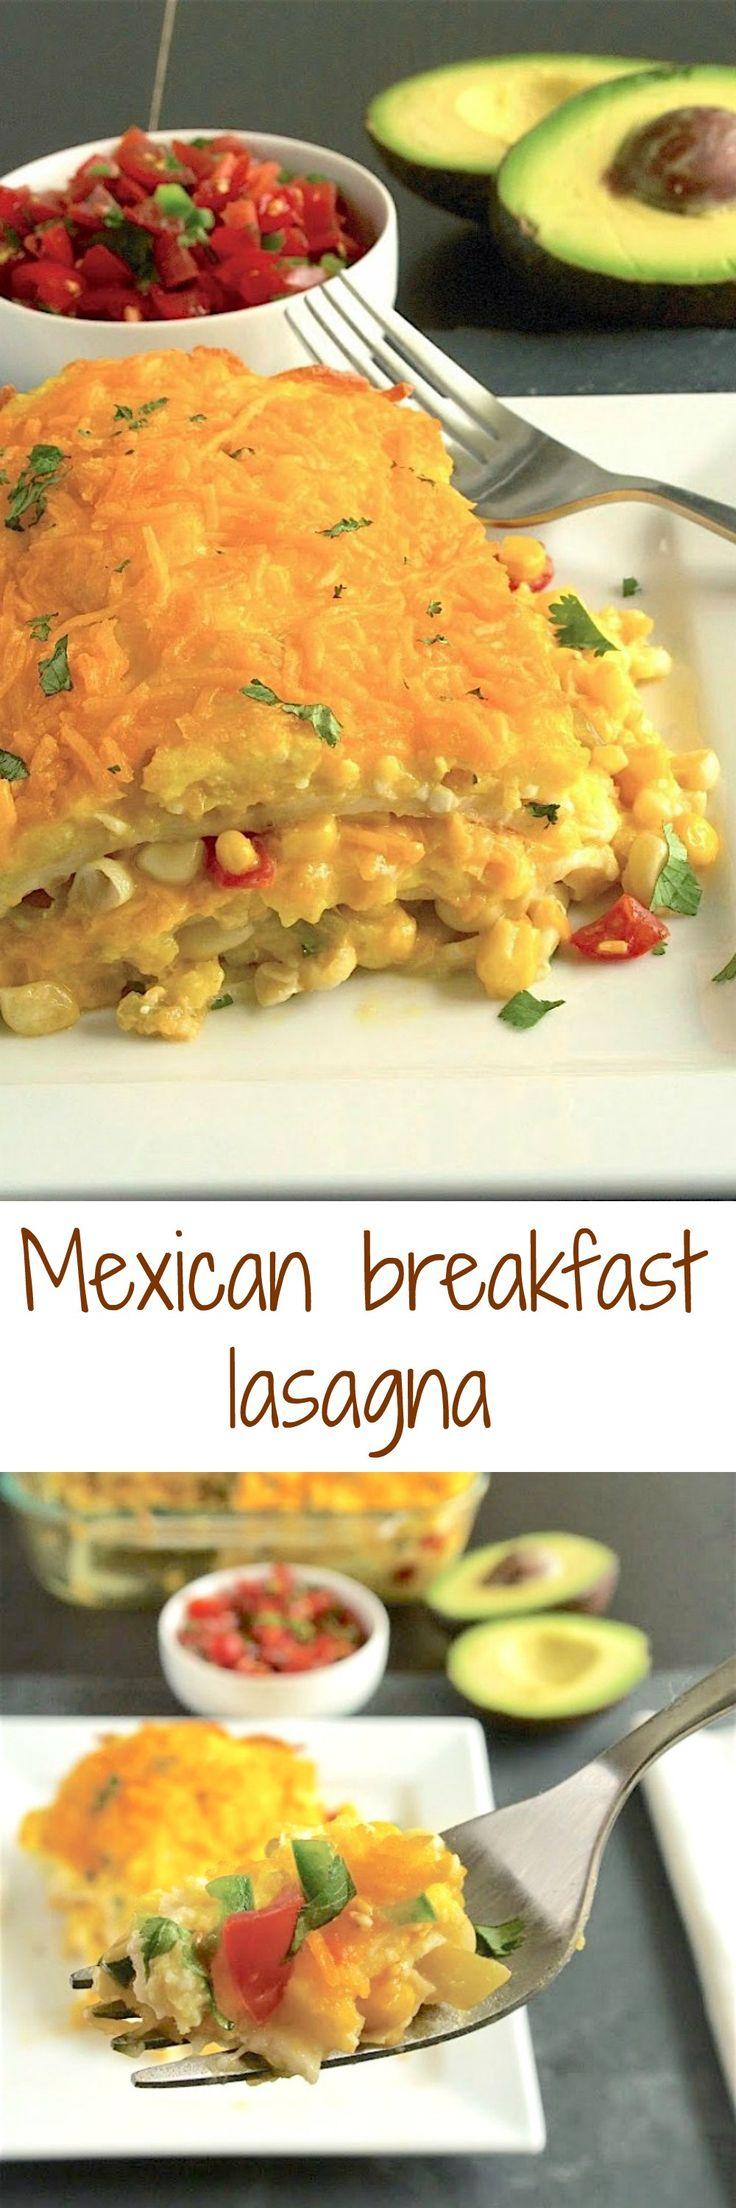 Mexican breakfast lasagna. Layers of scrambled egg, corn salsa, tortillas and cheese.